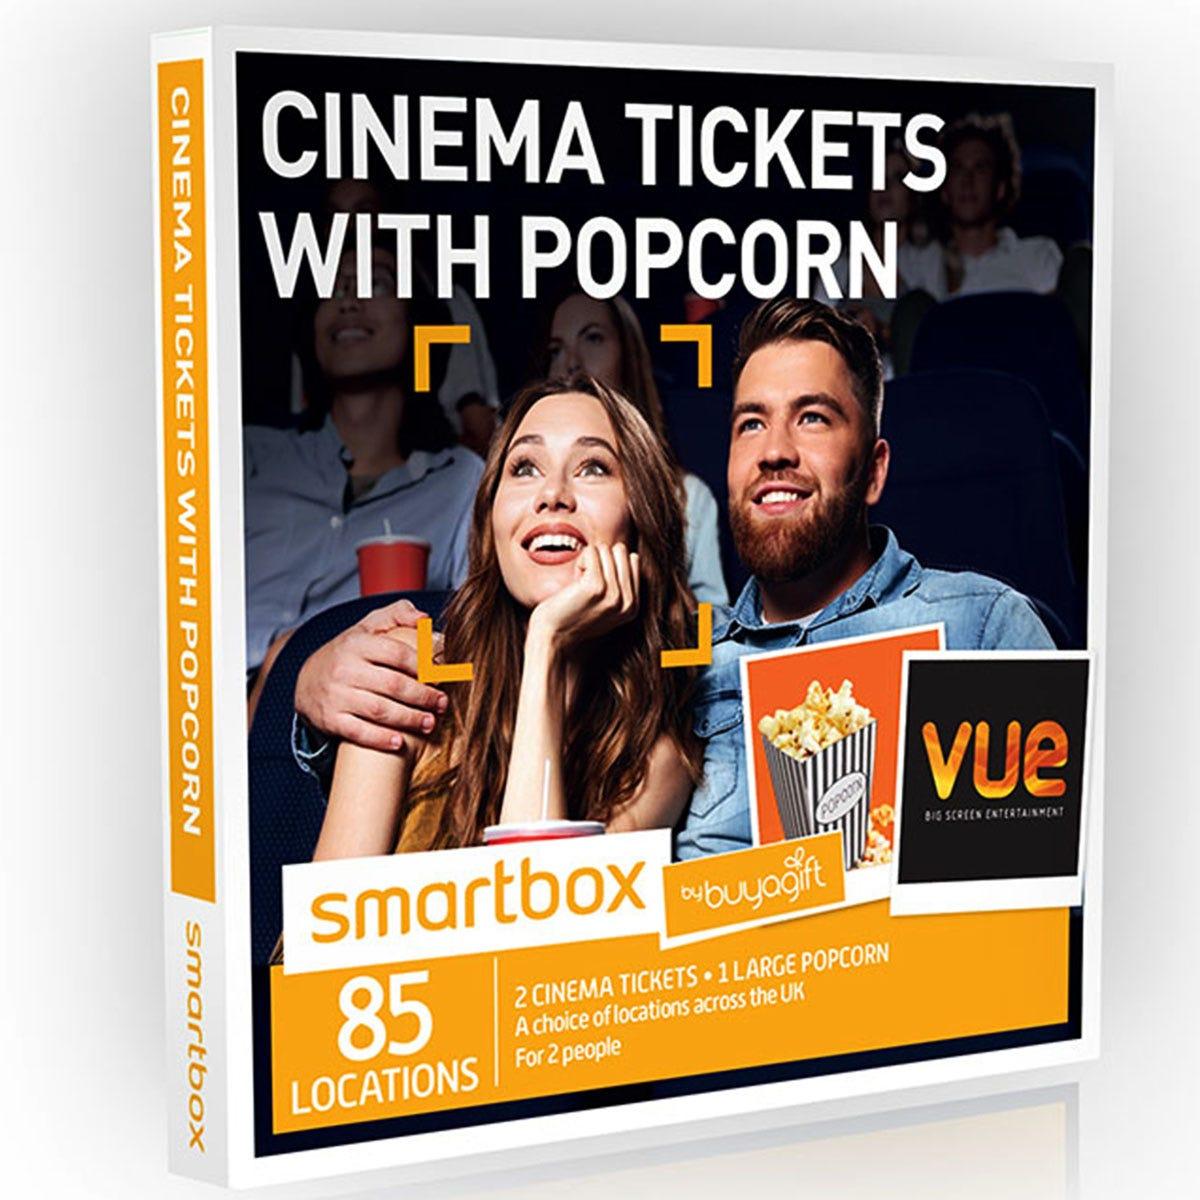 Buyagift Cinema Tickets with Popcorn